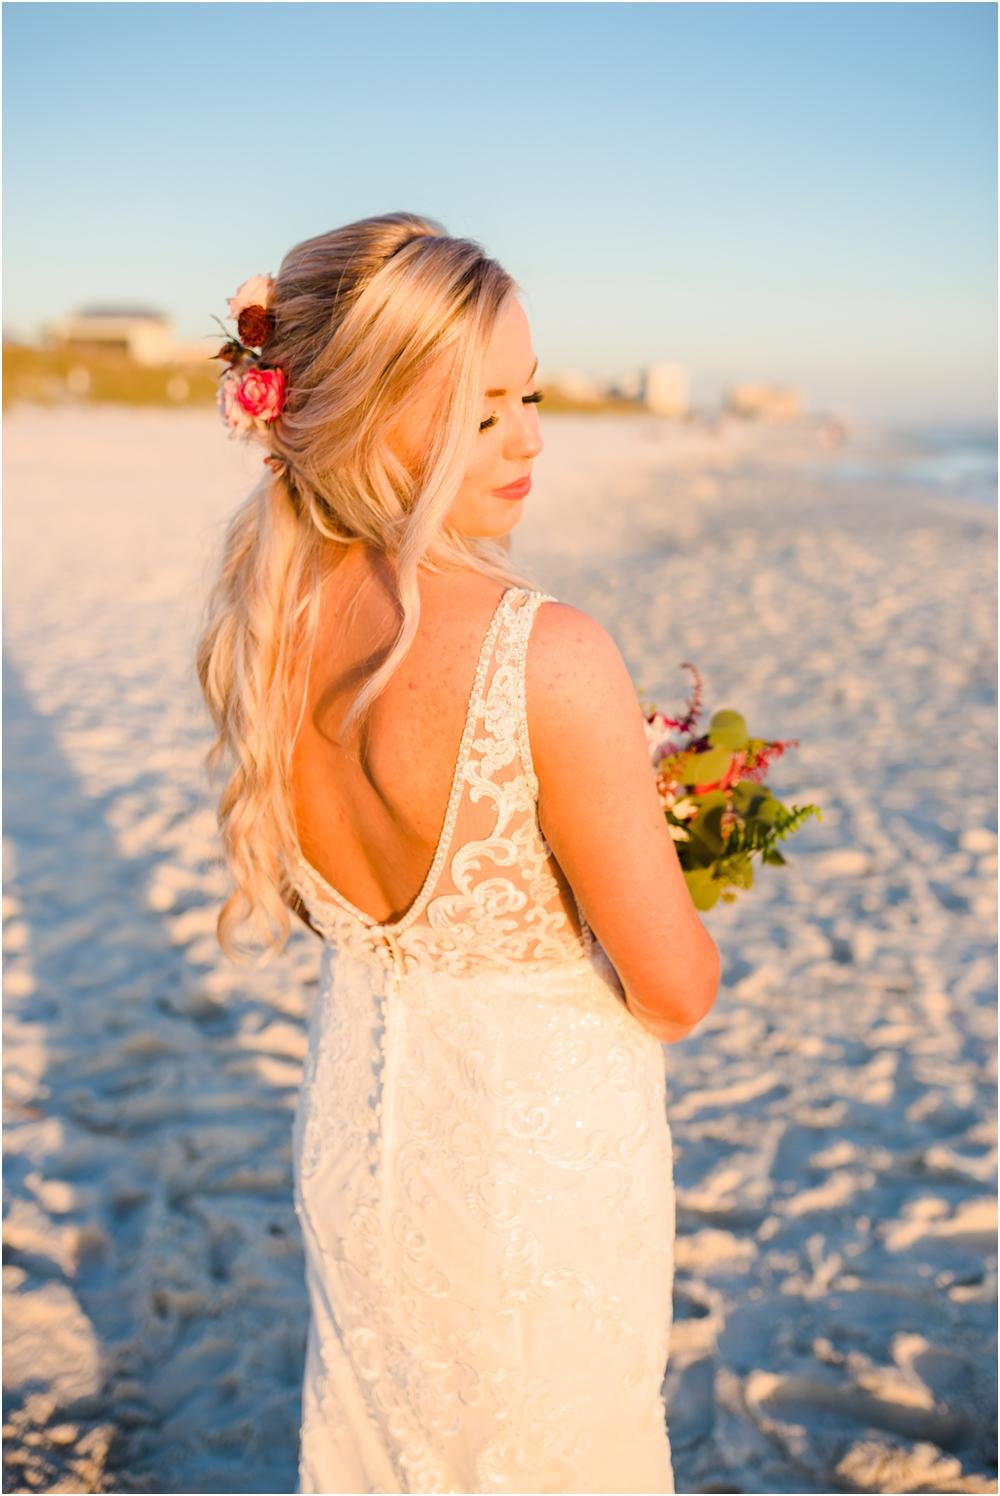 mcglothlin-wedding-kiersten-stevenson-photography-30a-panama-city-beach-dothan-tallahassee-(101-of-145).jpg